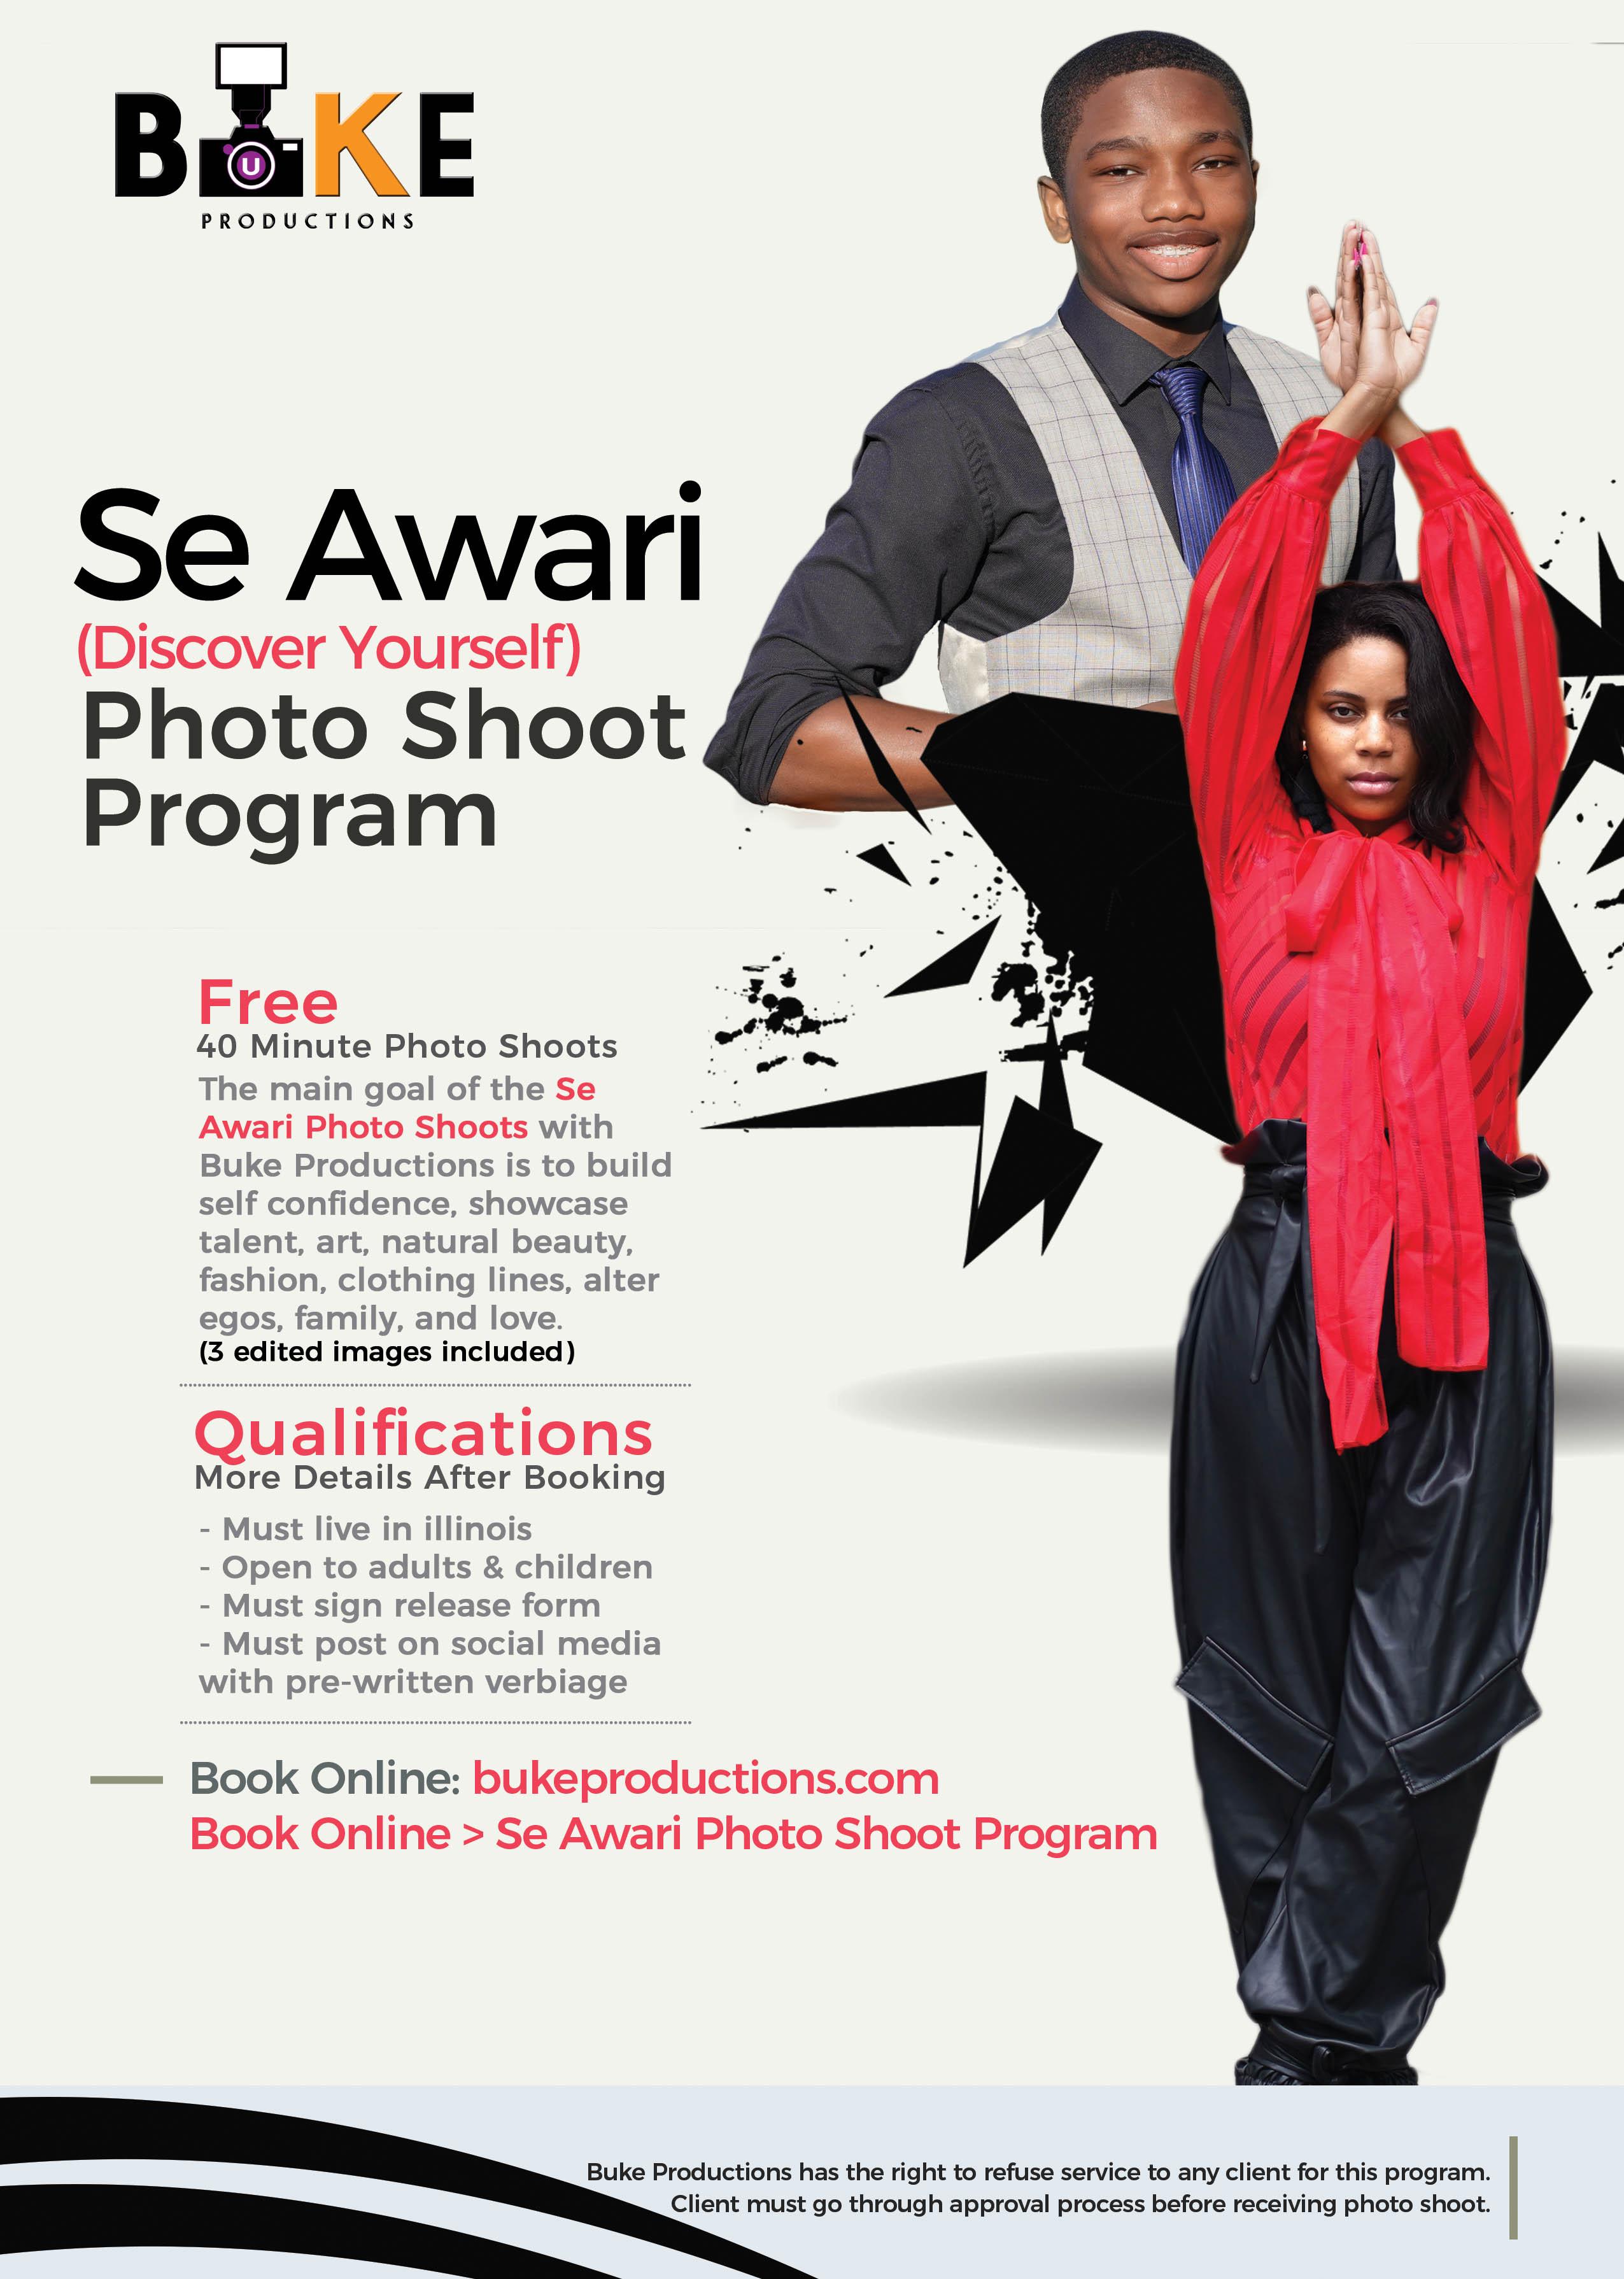 SE AWARI PHOTO SHOOT PROGRAM